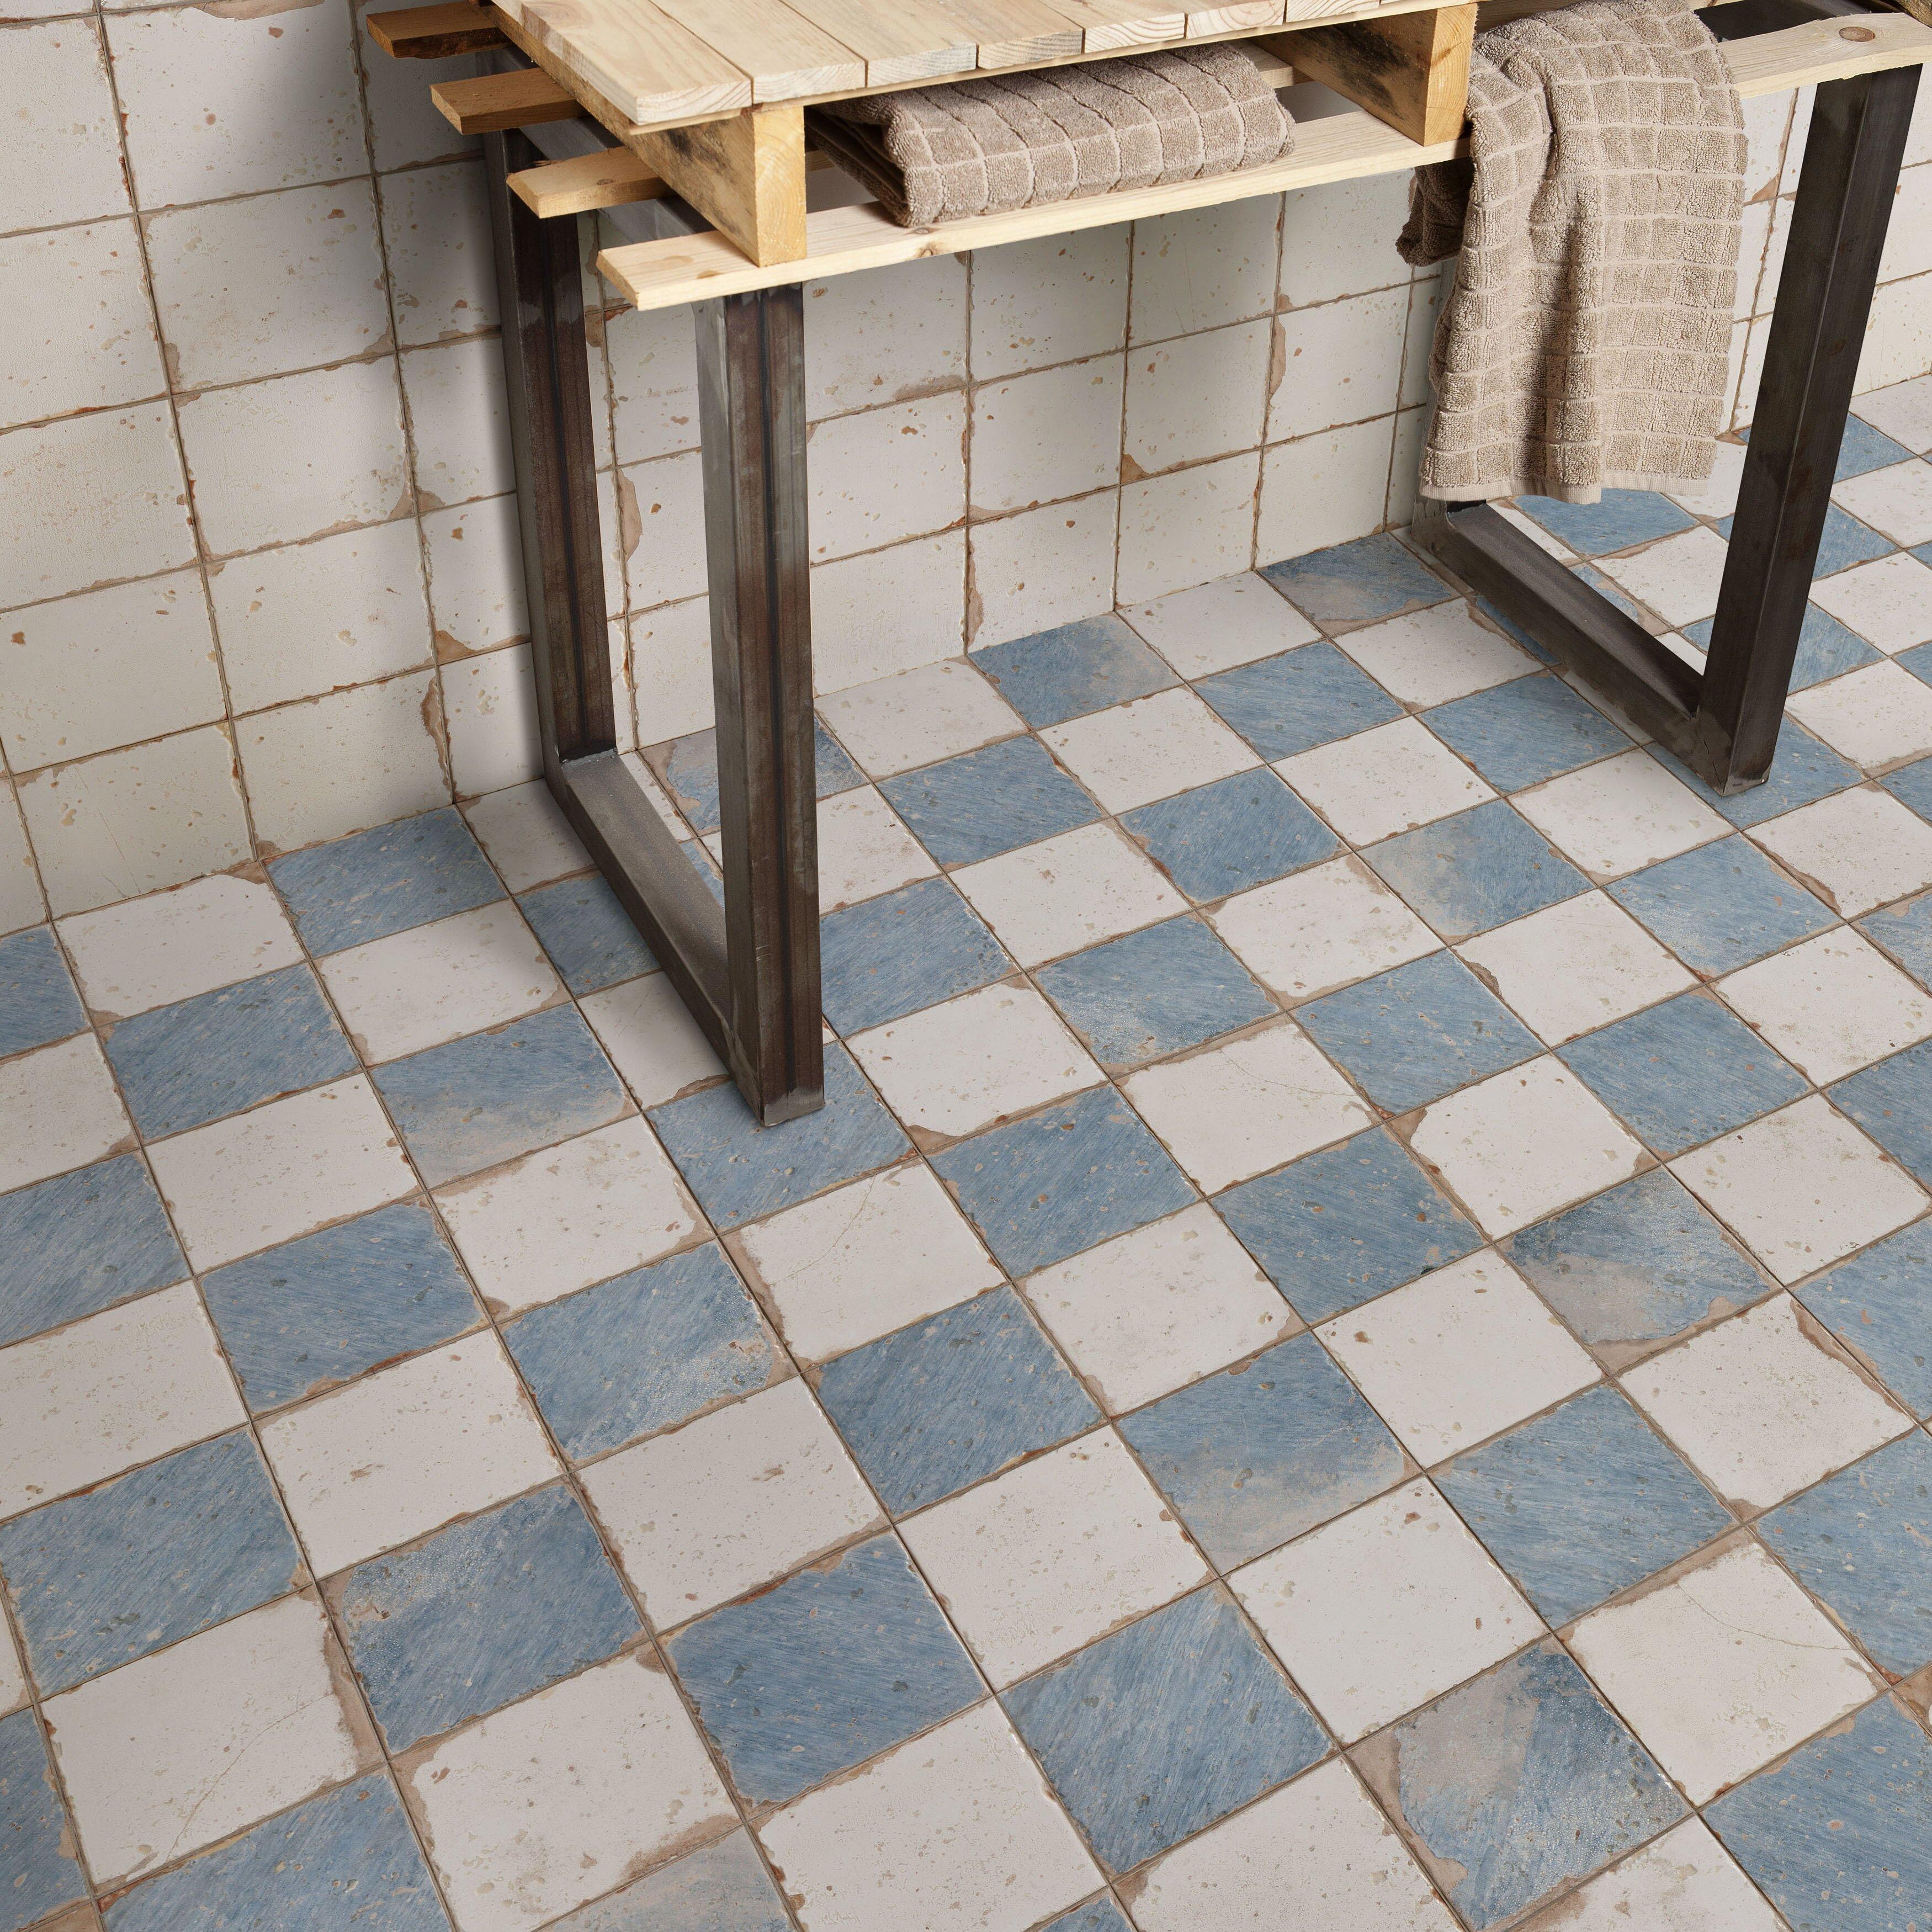 Elitetile artisanal 13 x 13 ceramic field tile in damero for 13 inch ceramic floor tile